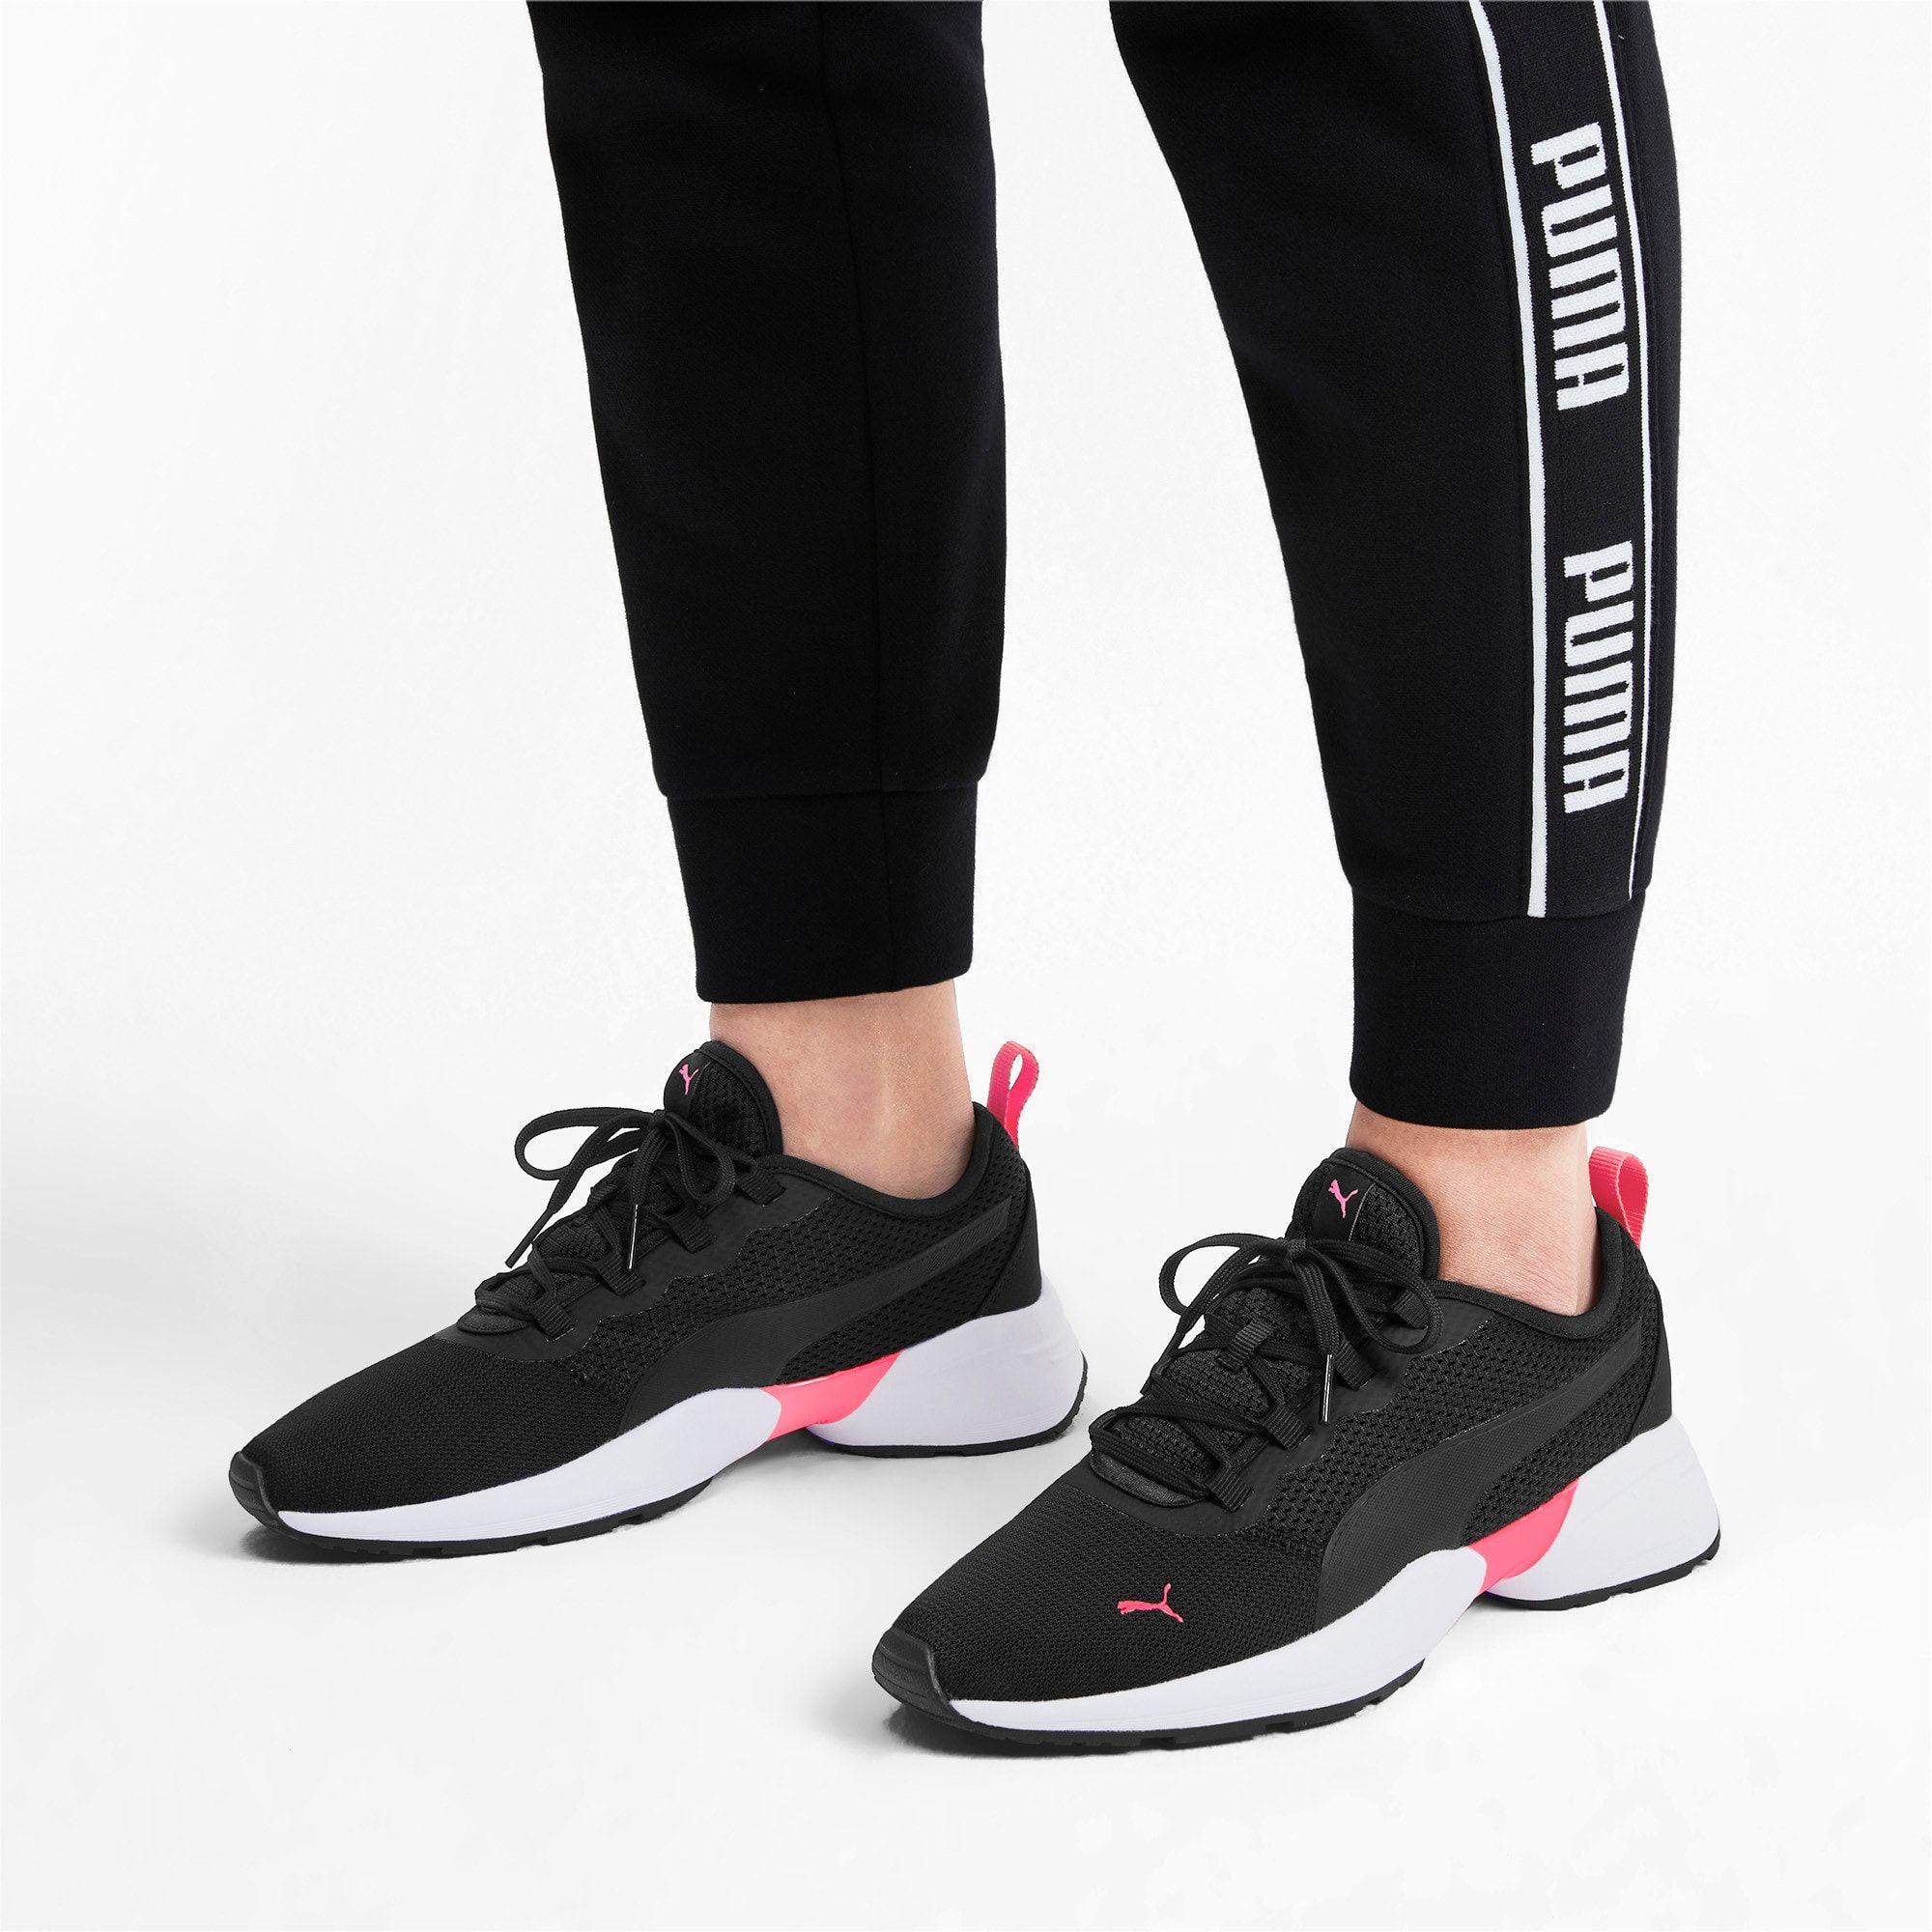 PUMA Sirena Sport Women's Trainers in Black/Pink Alert size ...